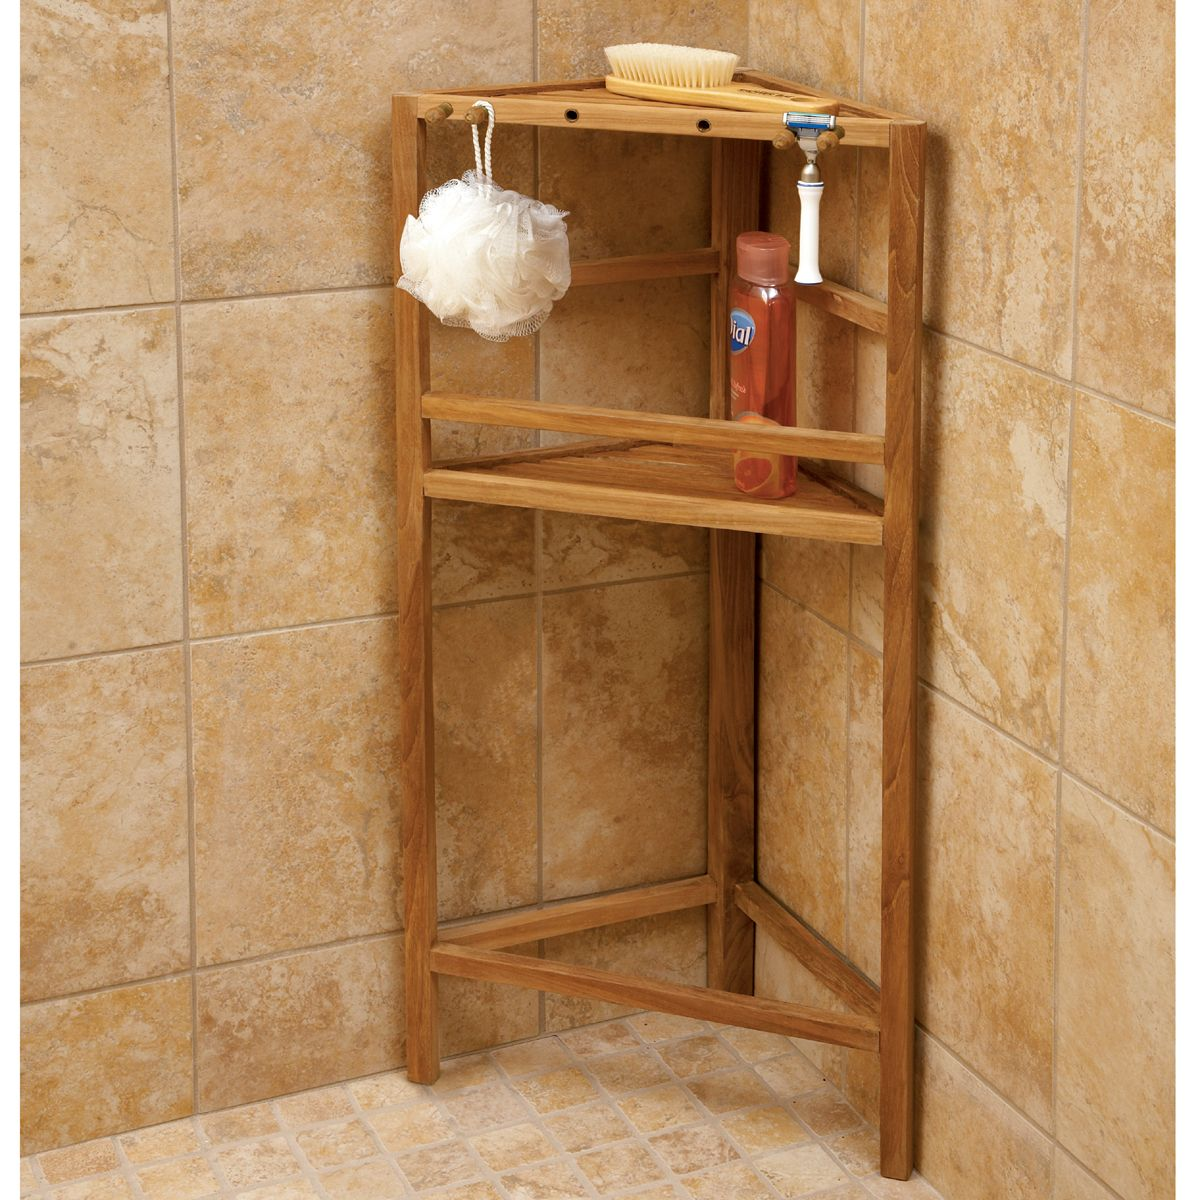 Shower Organizer More